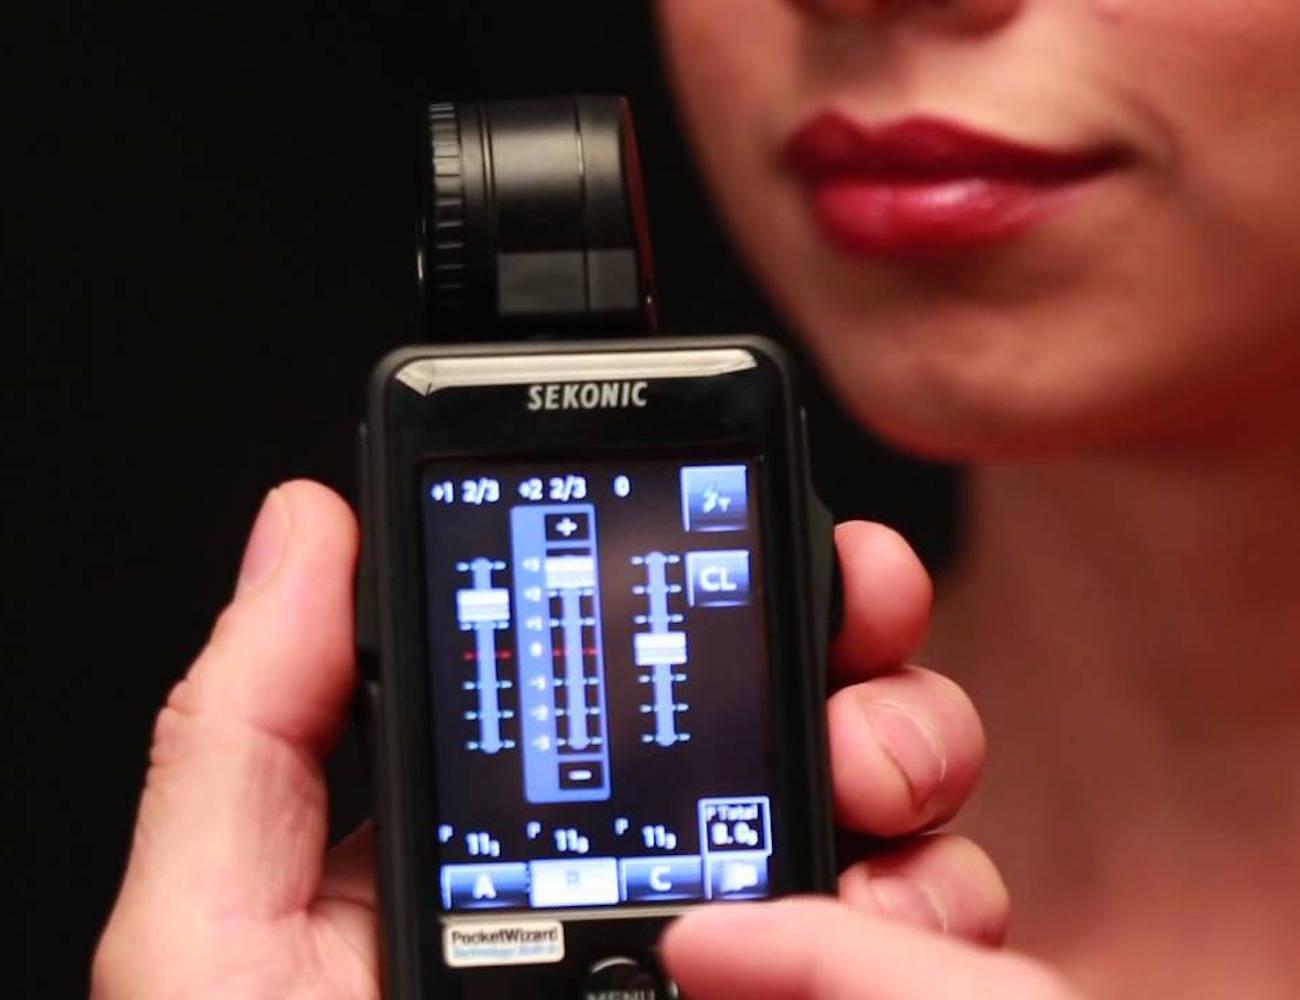 Sekonic+LiteMaster+Pro+L-478DR%2FD